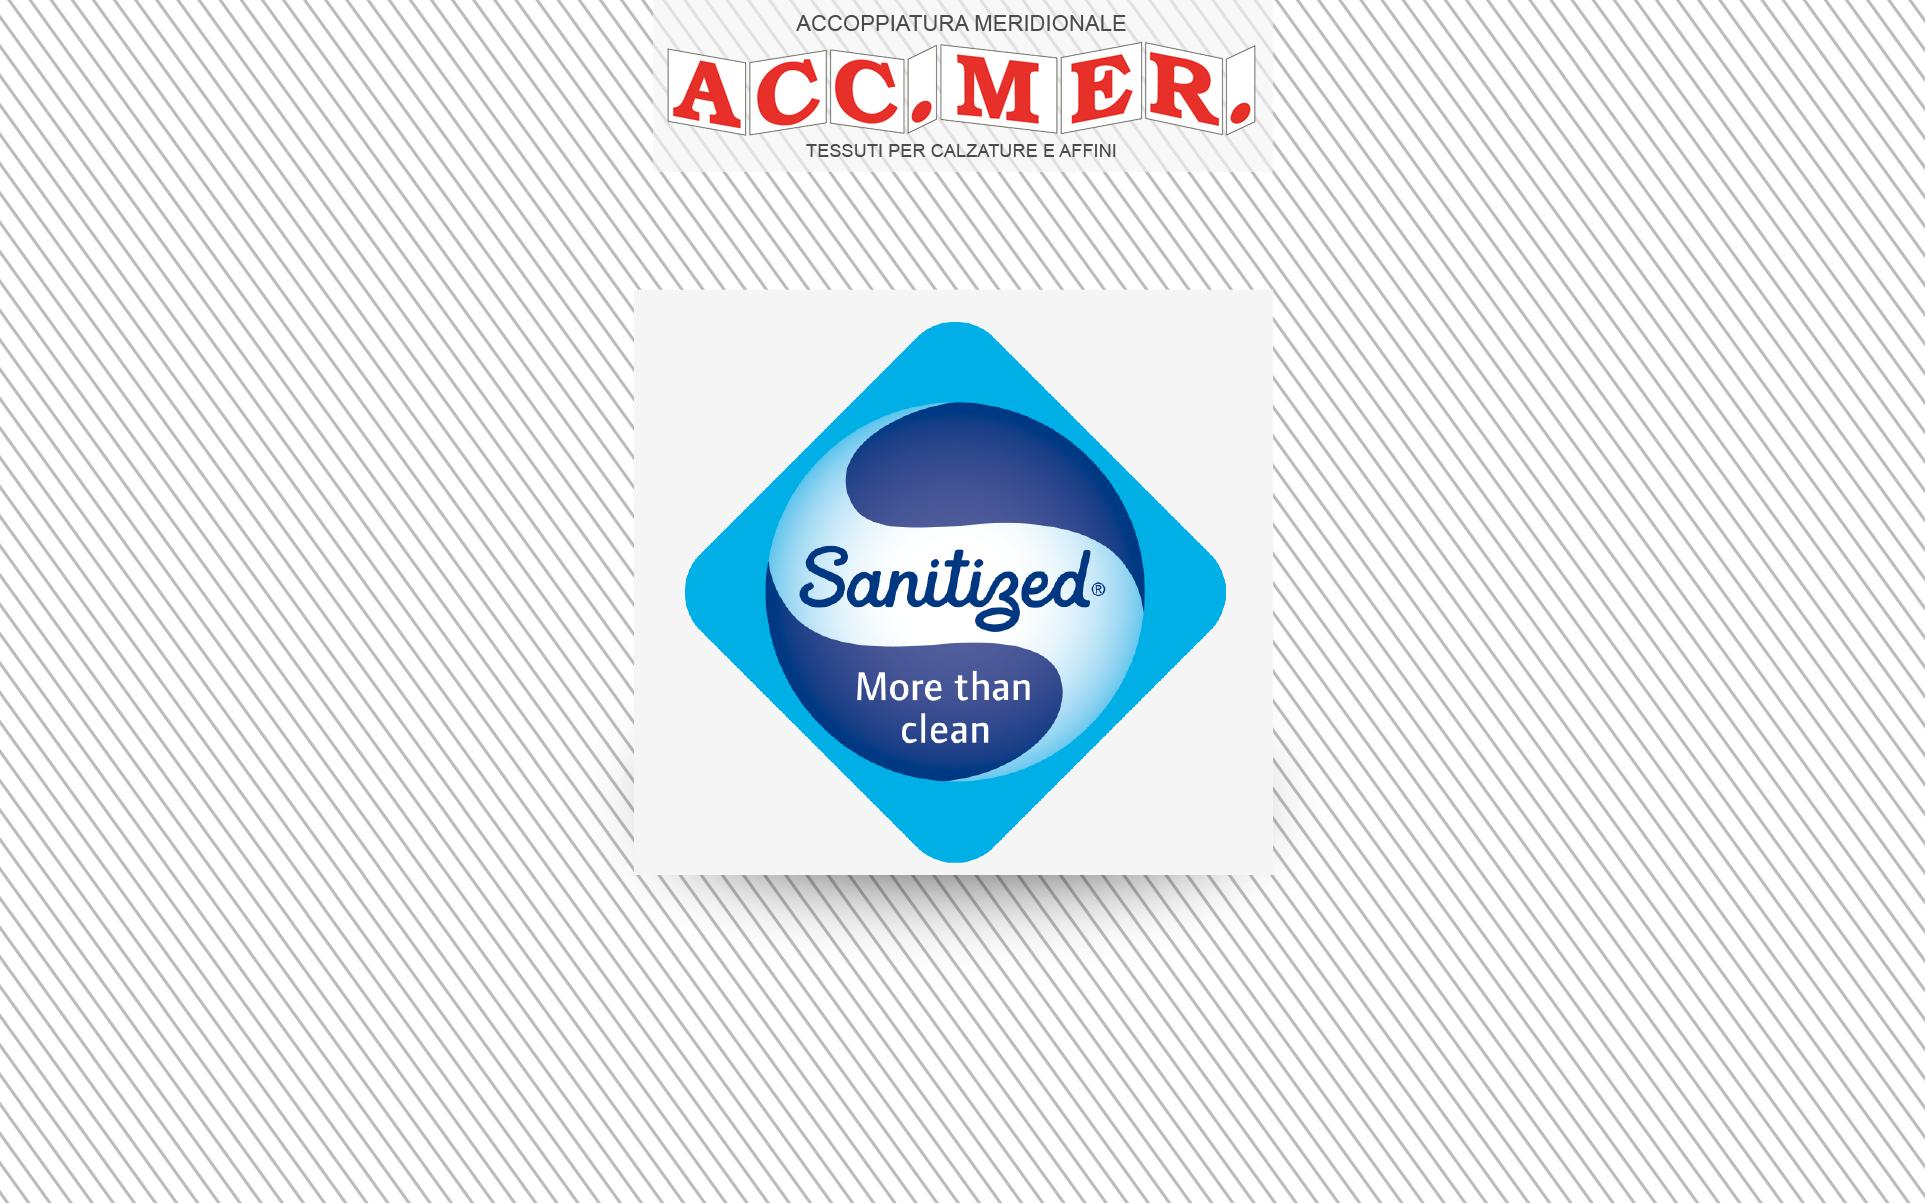 accmer-box-accoppiatura-tessuti-speciali-sanitized